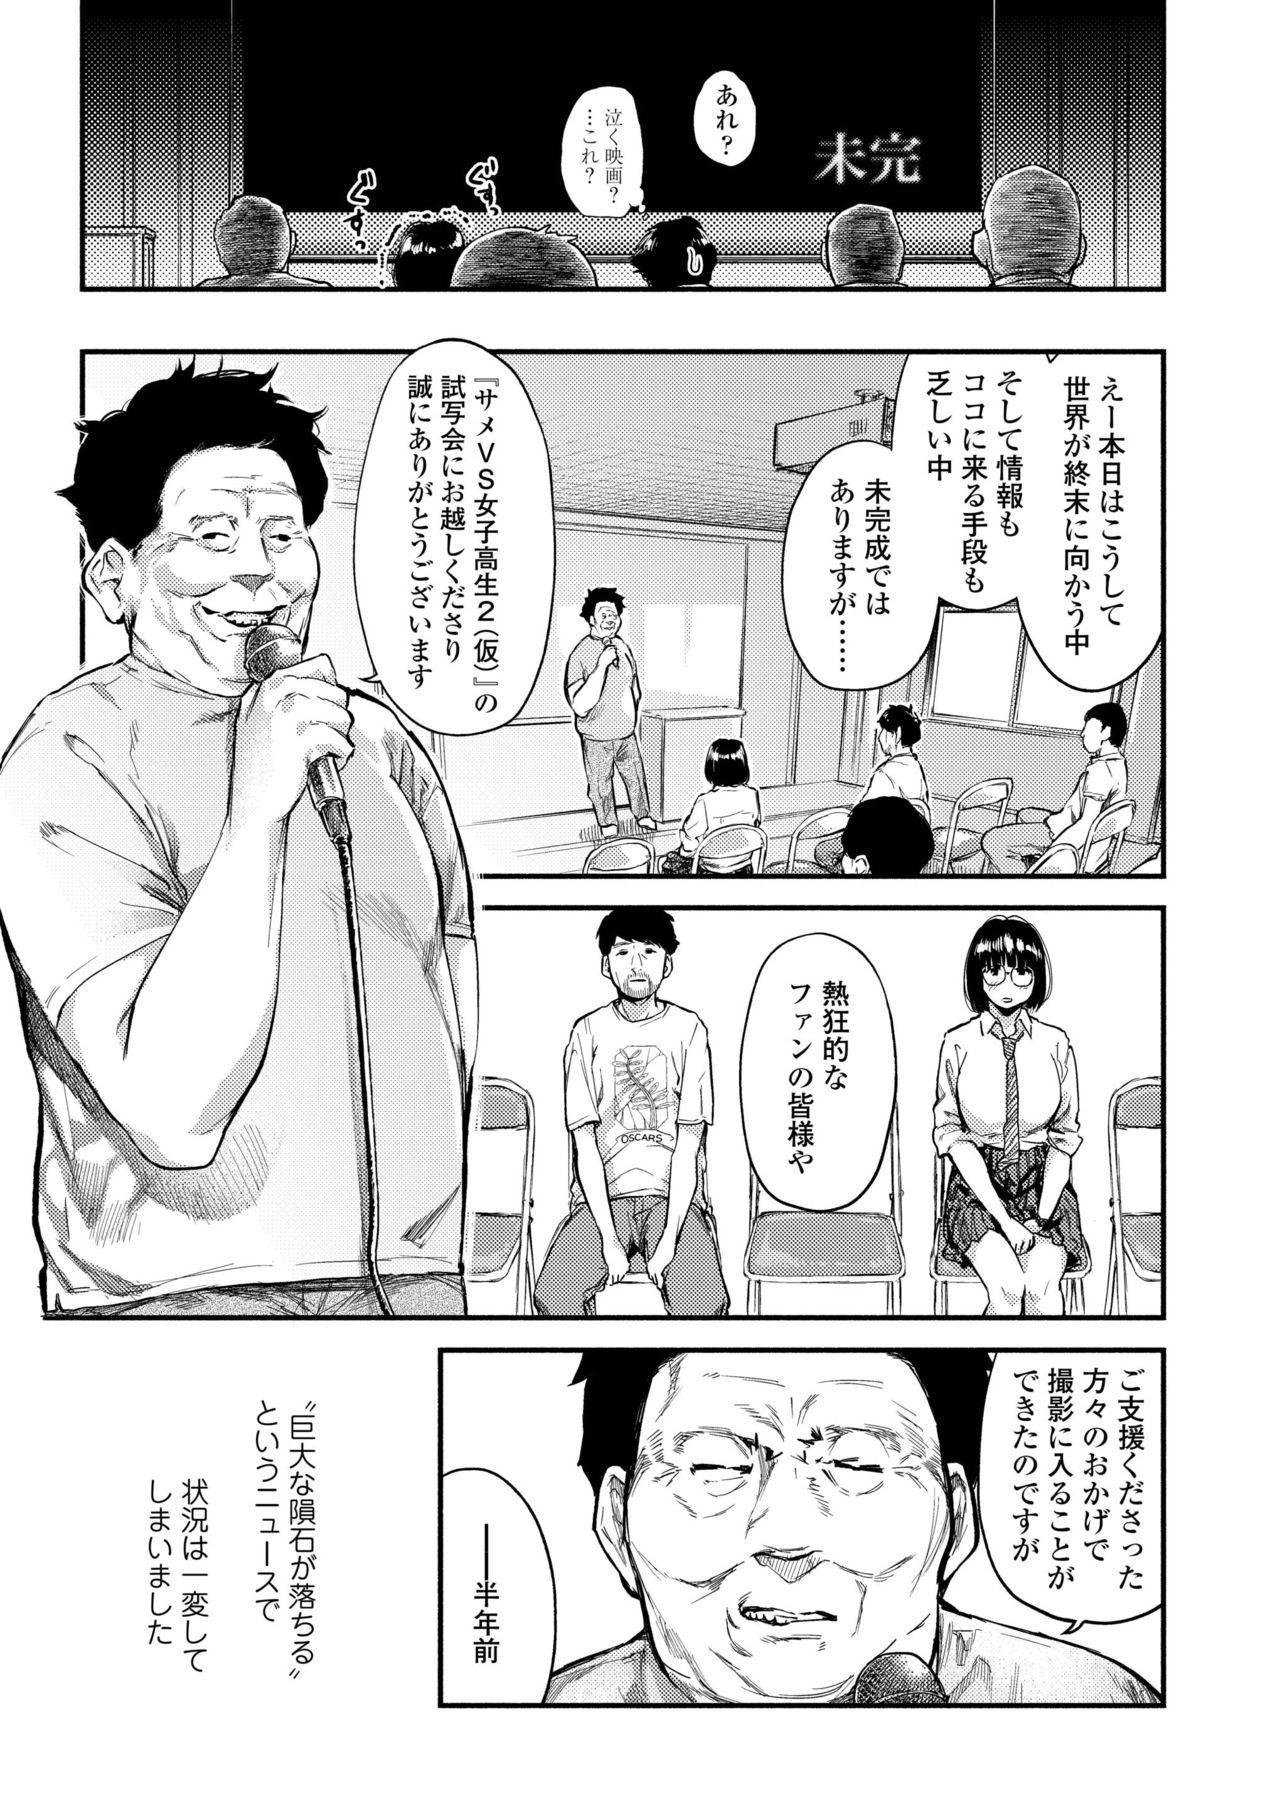 COMIC AOHA 2019 Haru 270